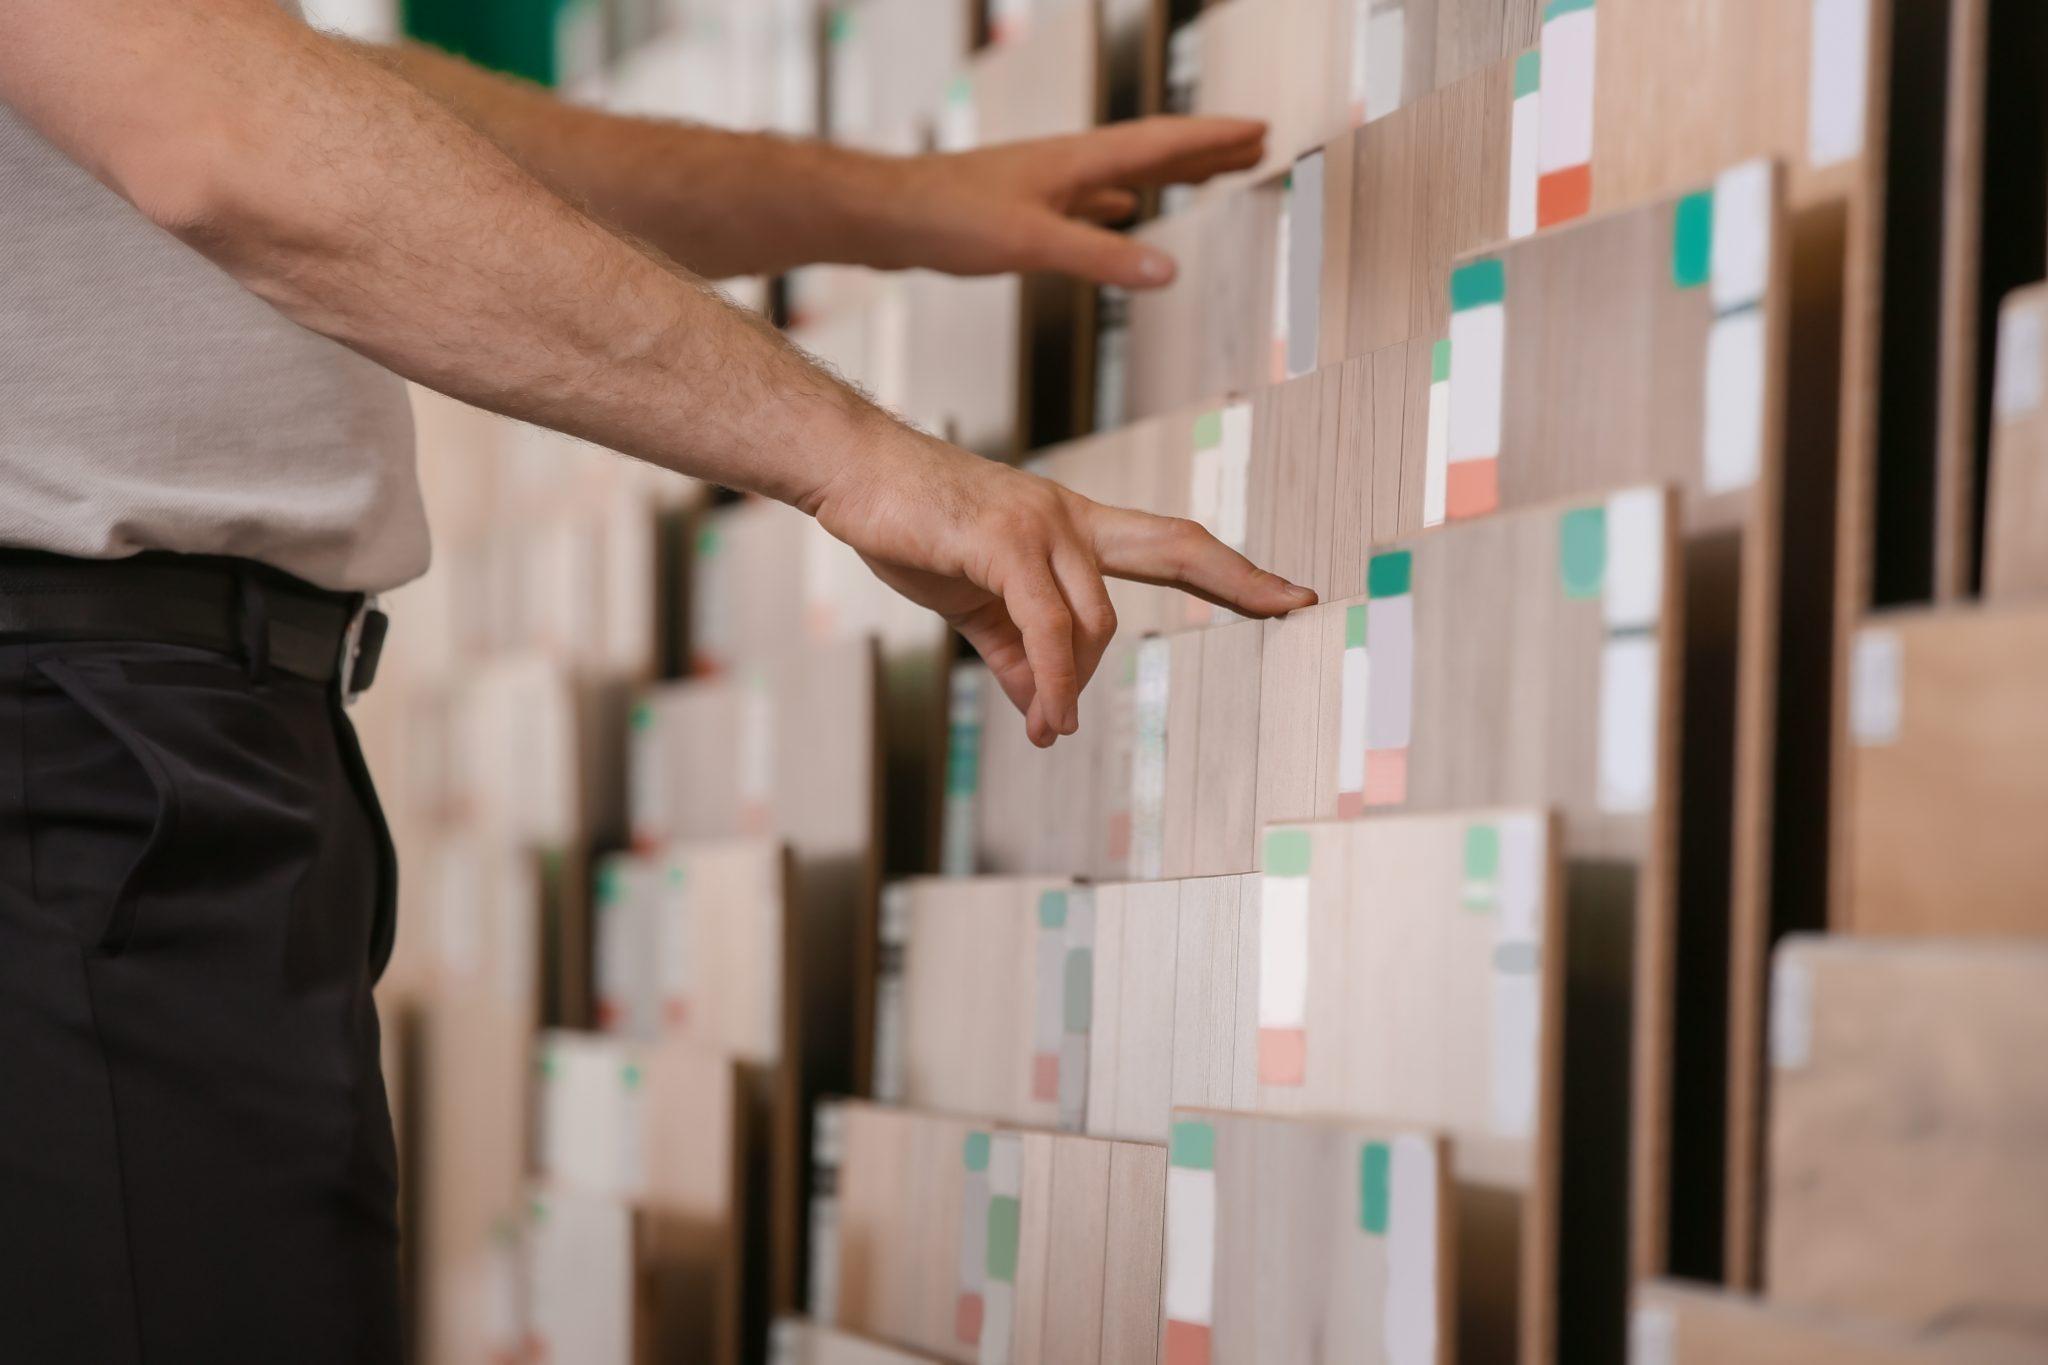 Man choosing laminate samples in hardware store